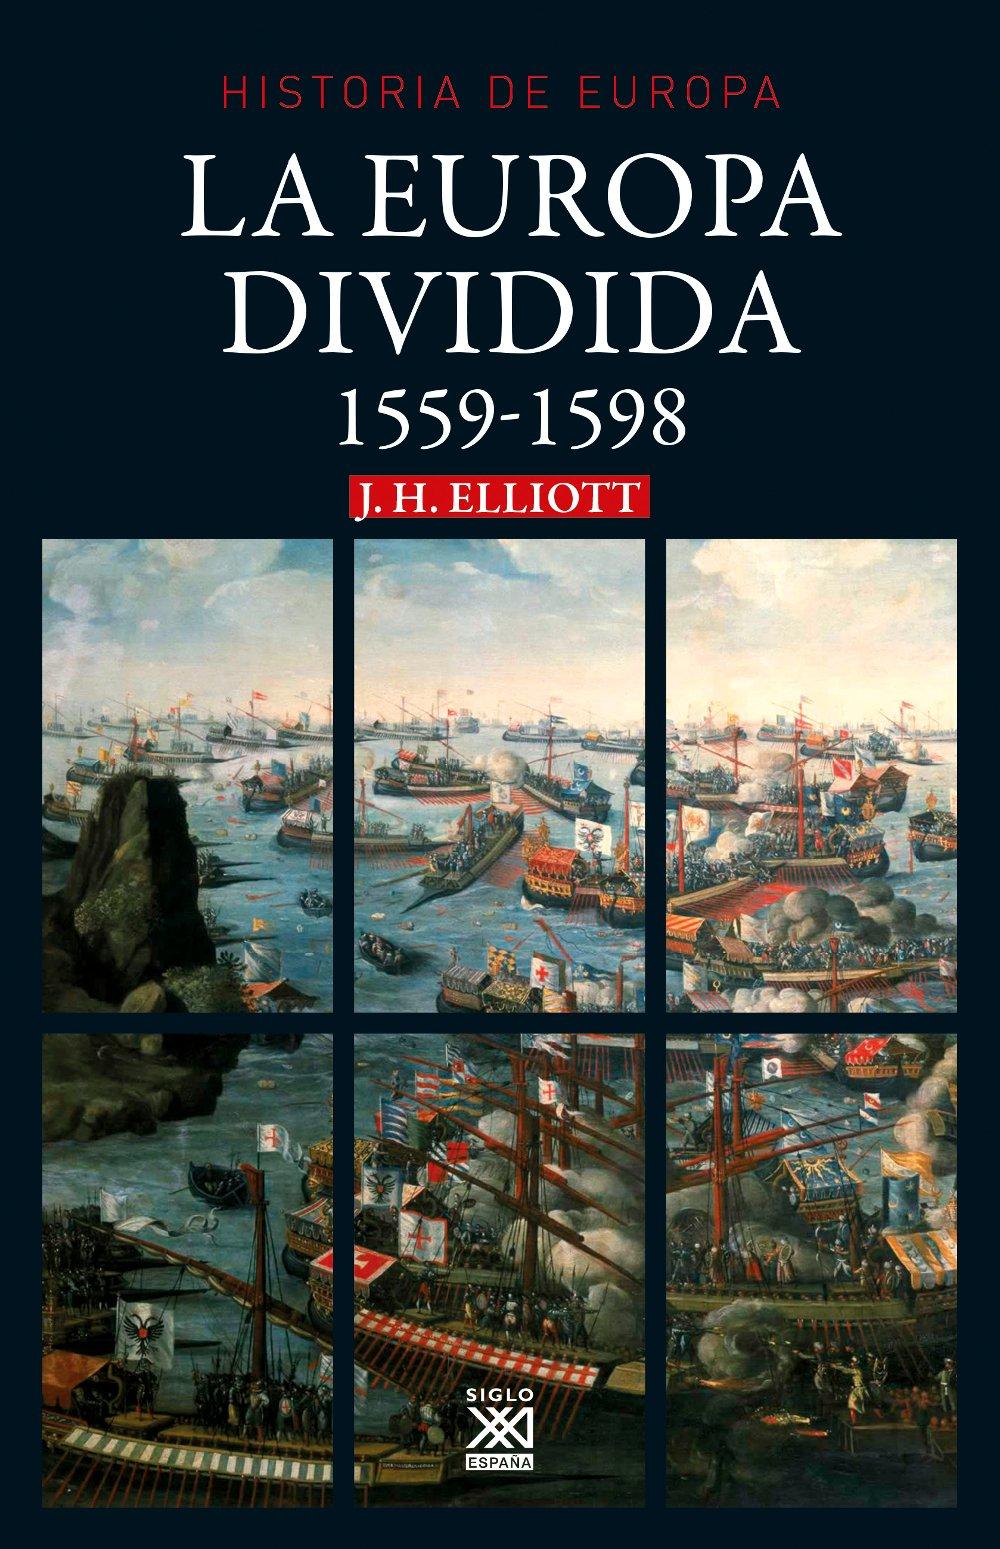 La Europa dividida. 1559-1598 (Historia de Europa): Amazon.es: Elliott, John H., Sánchez Mantero, Rafael: Libros